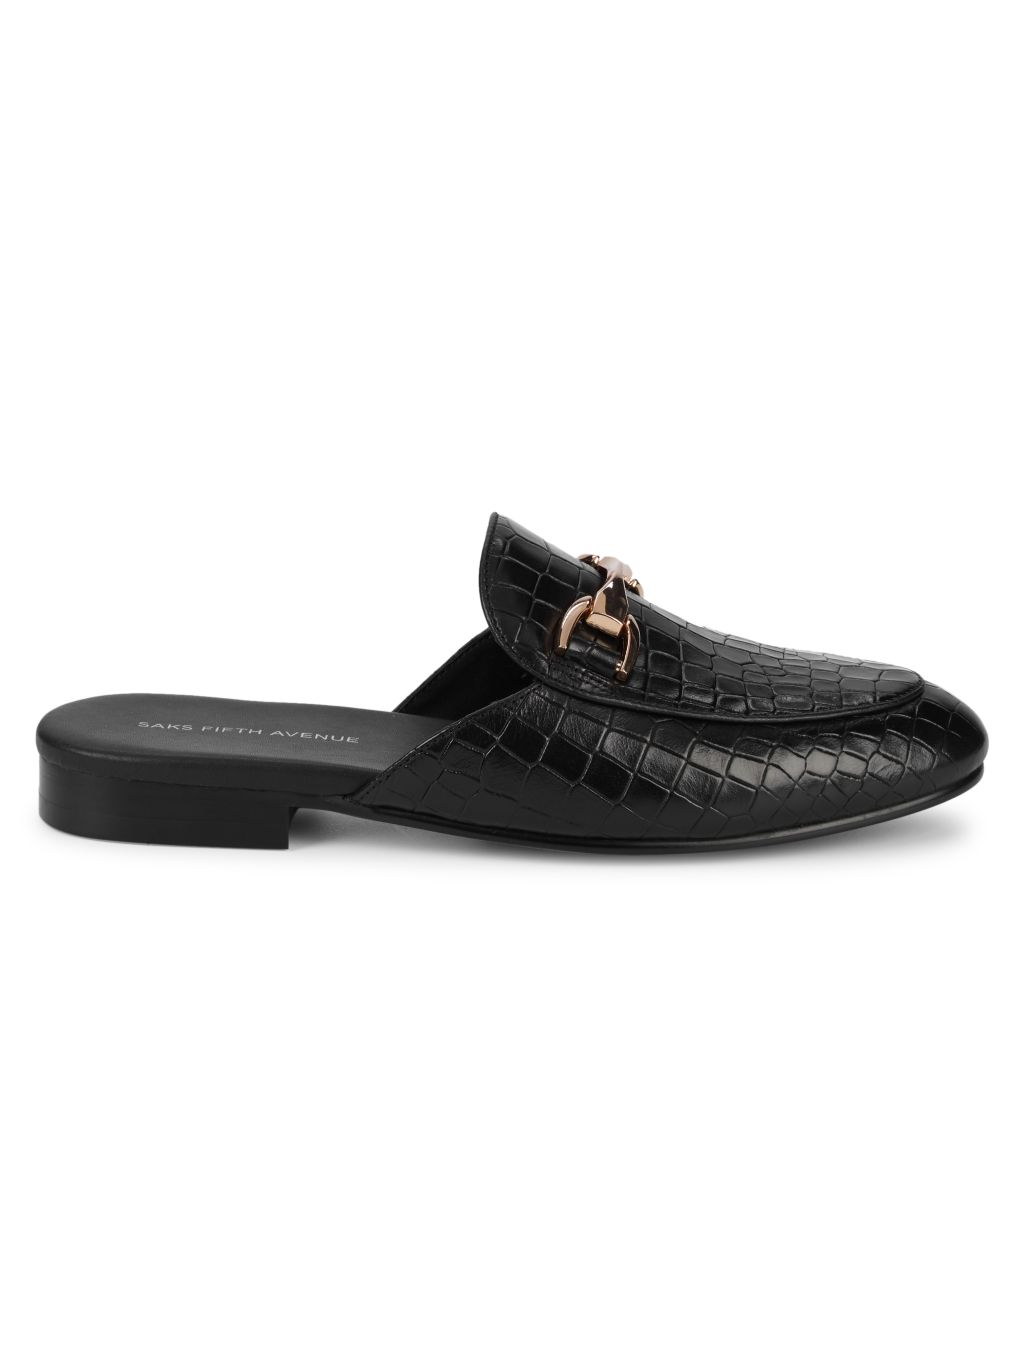 Saks Fifth Avenue Rupert Croc-Embossed Leather Mules